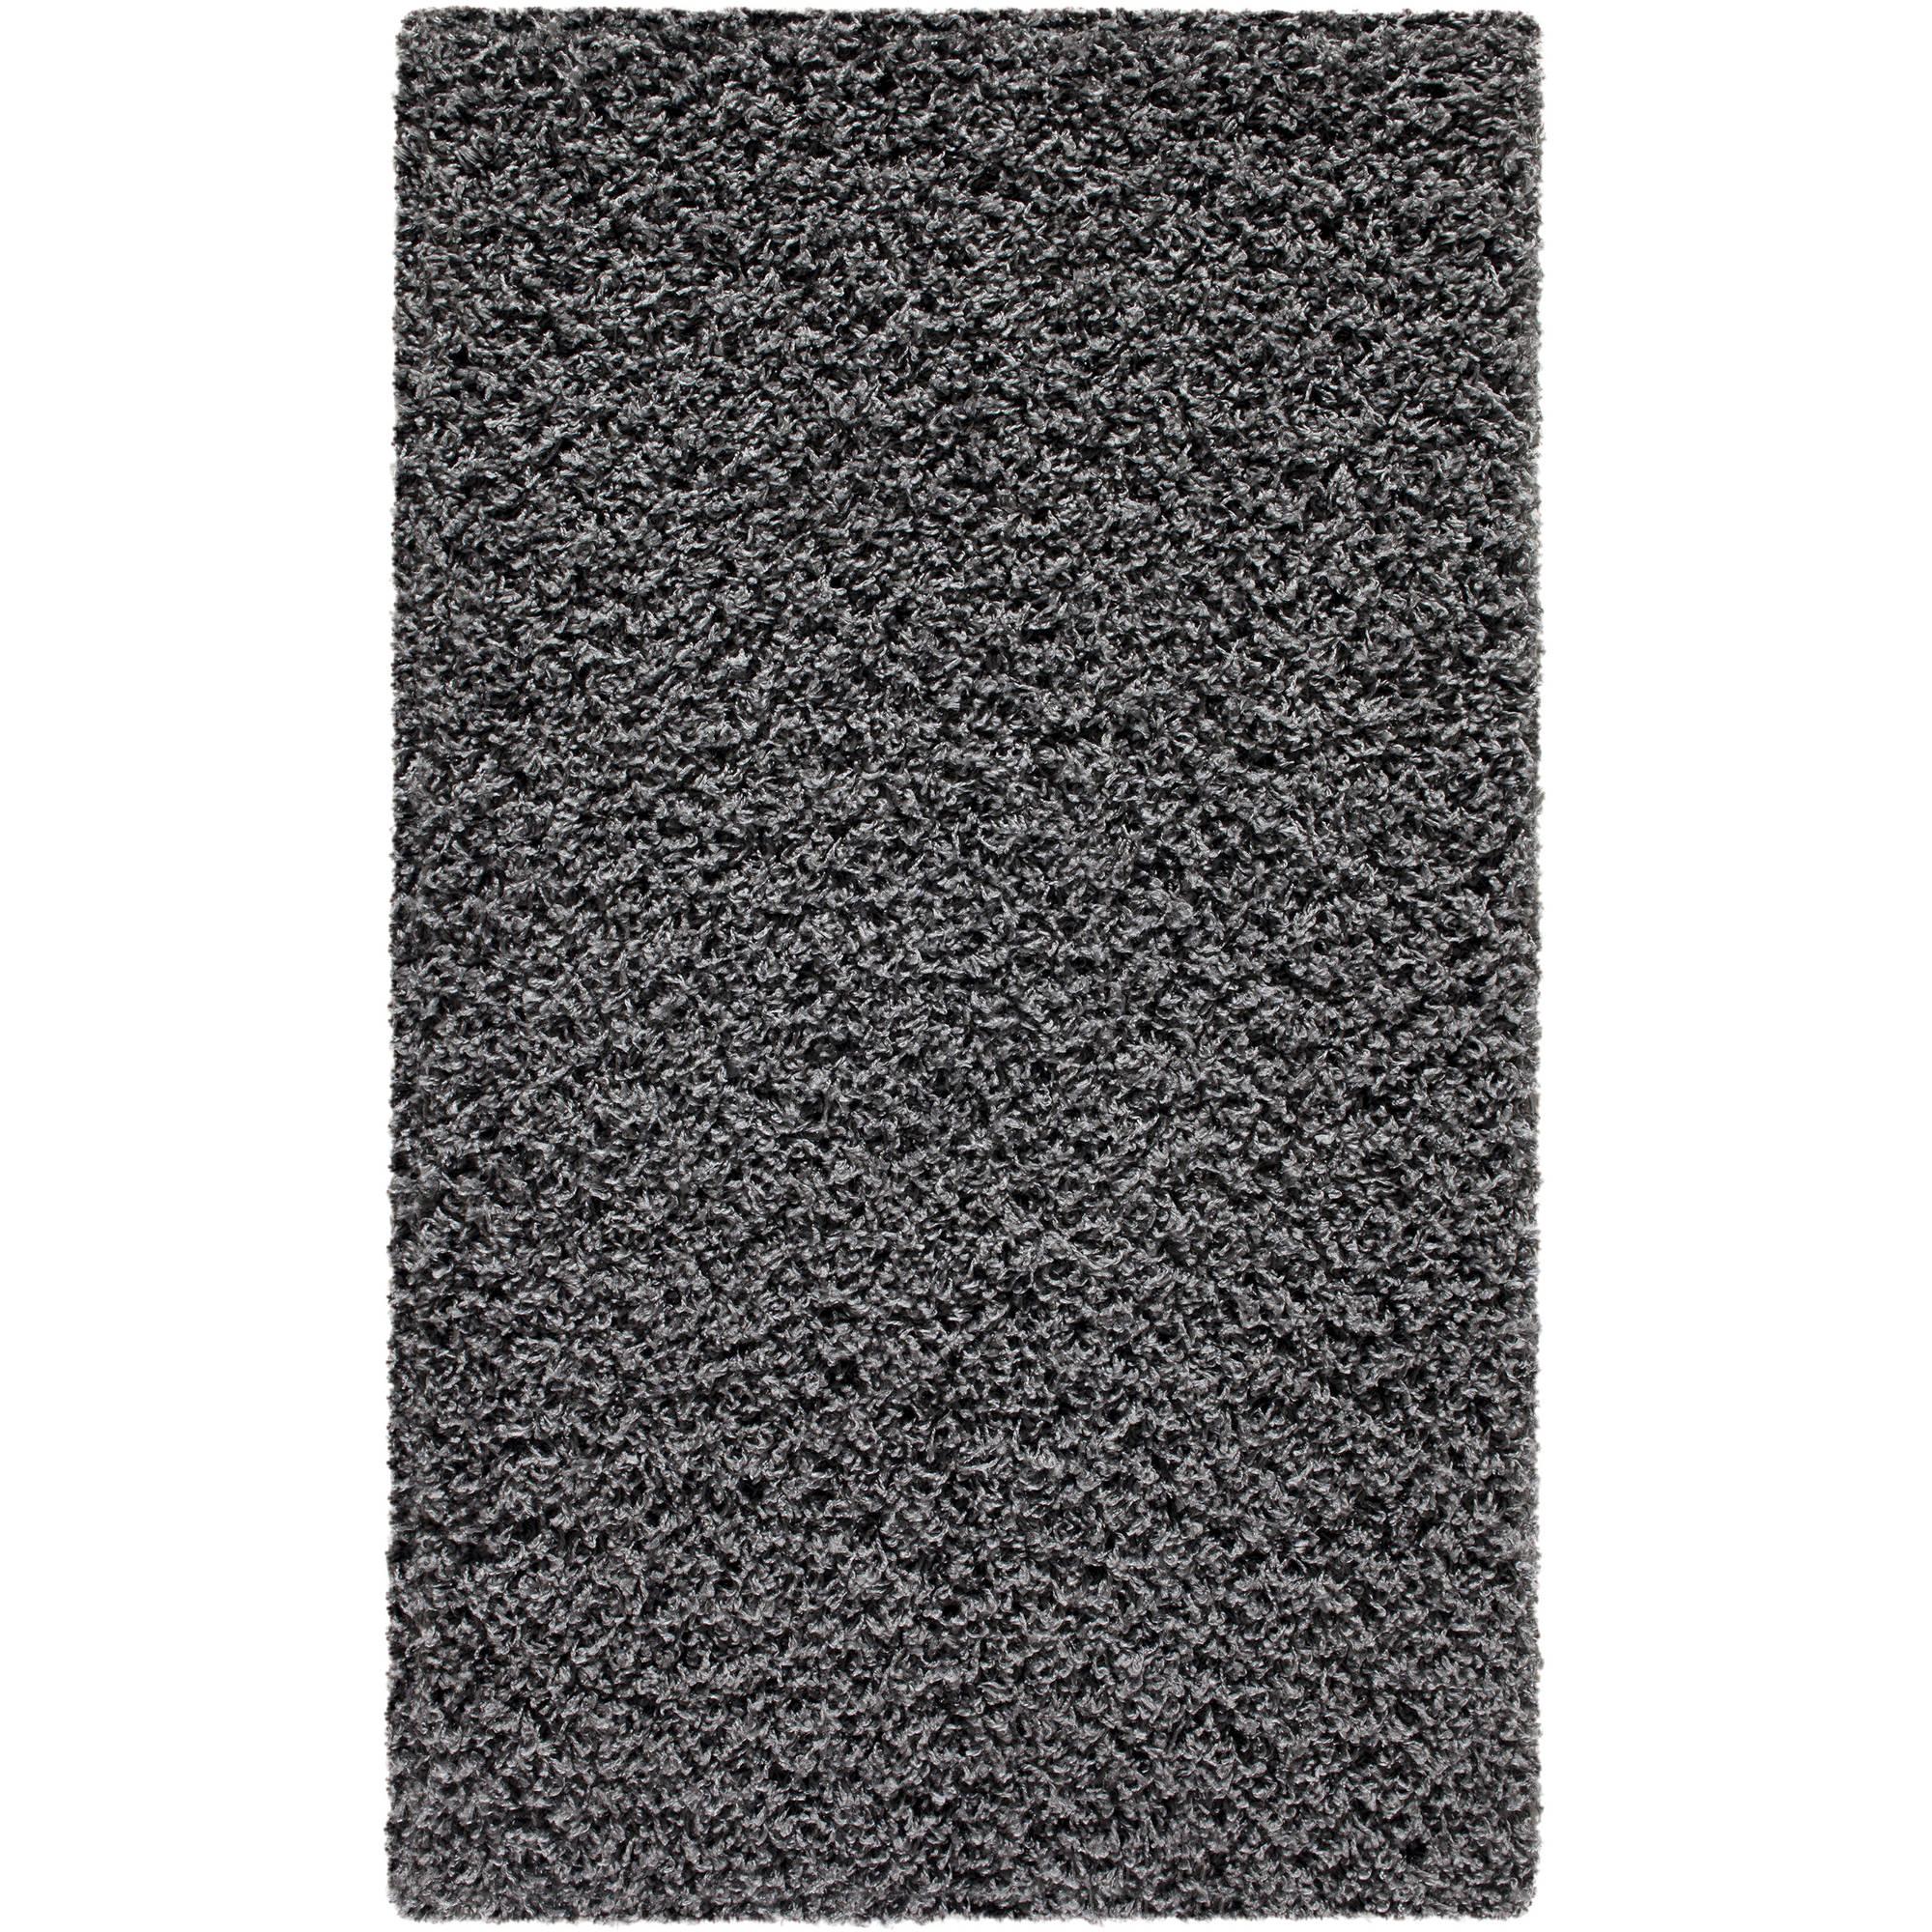 shaggy rugs mainstays polyester shag area rugs or runner FYLJKAI